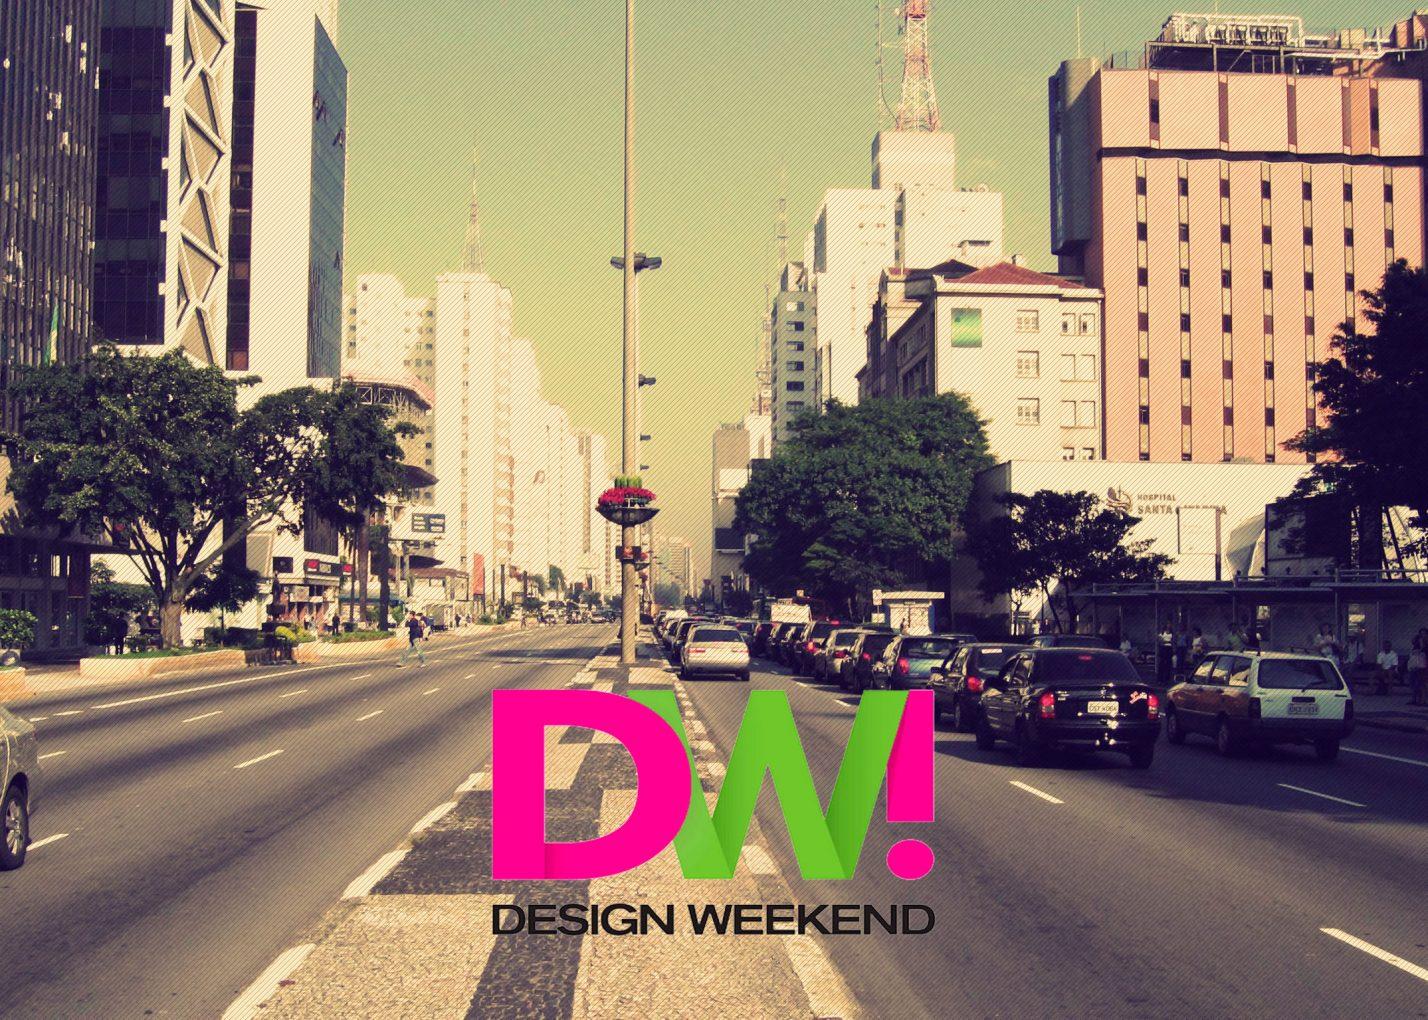 DW! Design Weekend 2019 Event Guide dw! design weekend 2019 event guide DW! DESIGN WEEKEND 2019 EVENT GUIDE Chamada DW DC